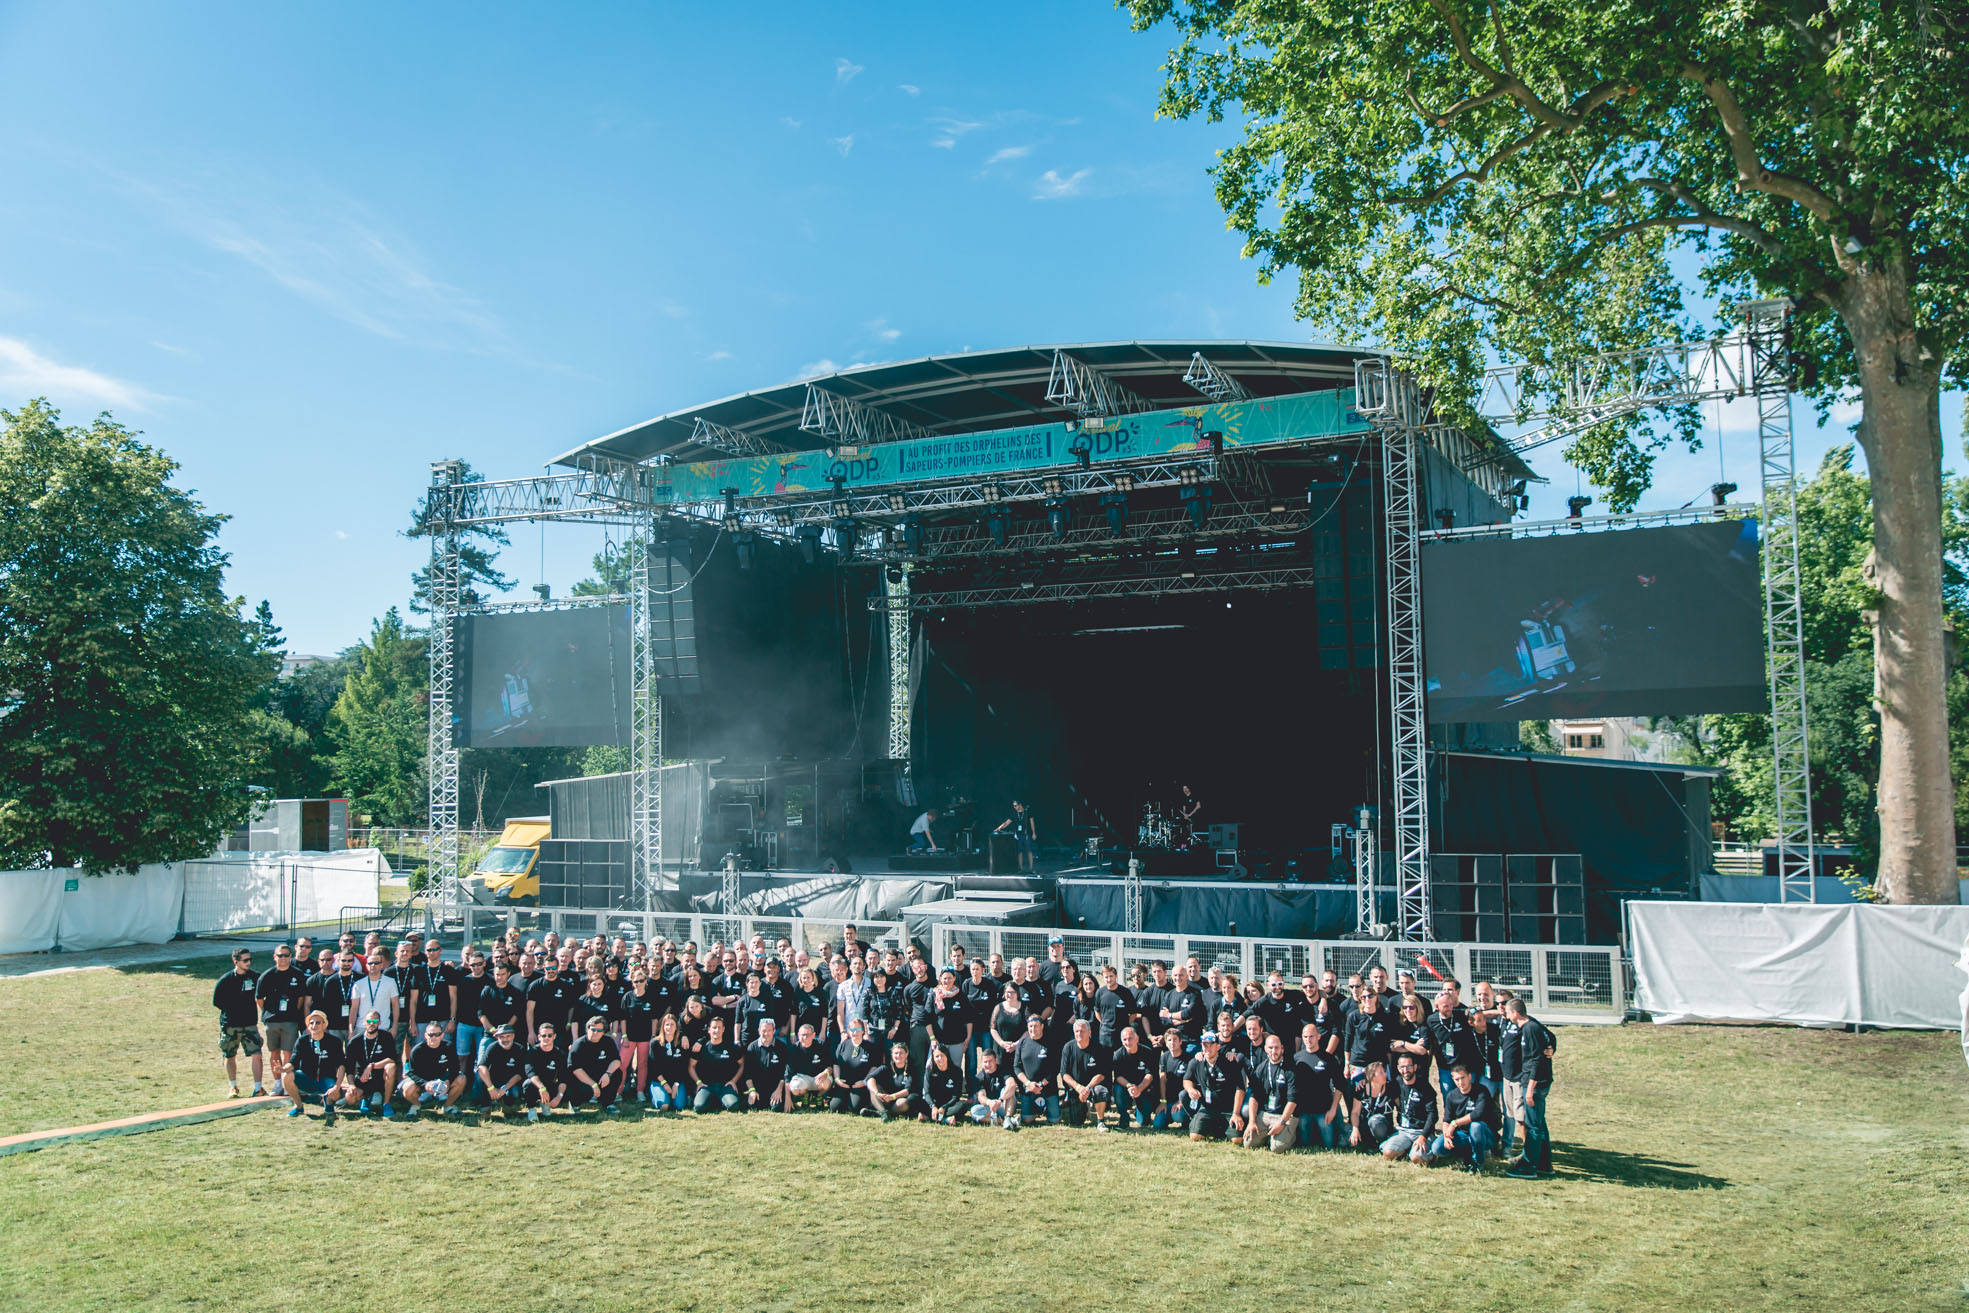 photographe concert, jean-baptiste Chauvin Photographe, www.studioart-photographe.fr